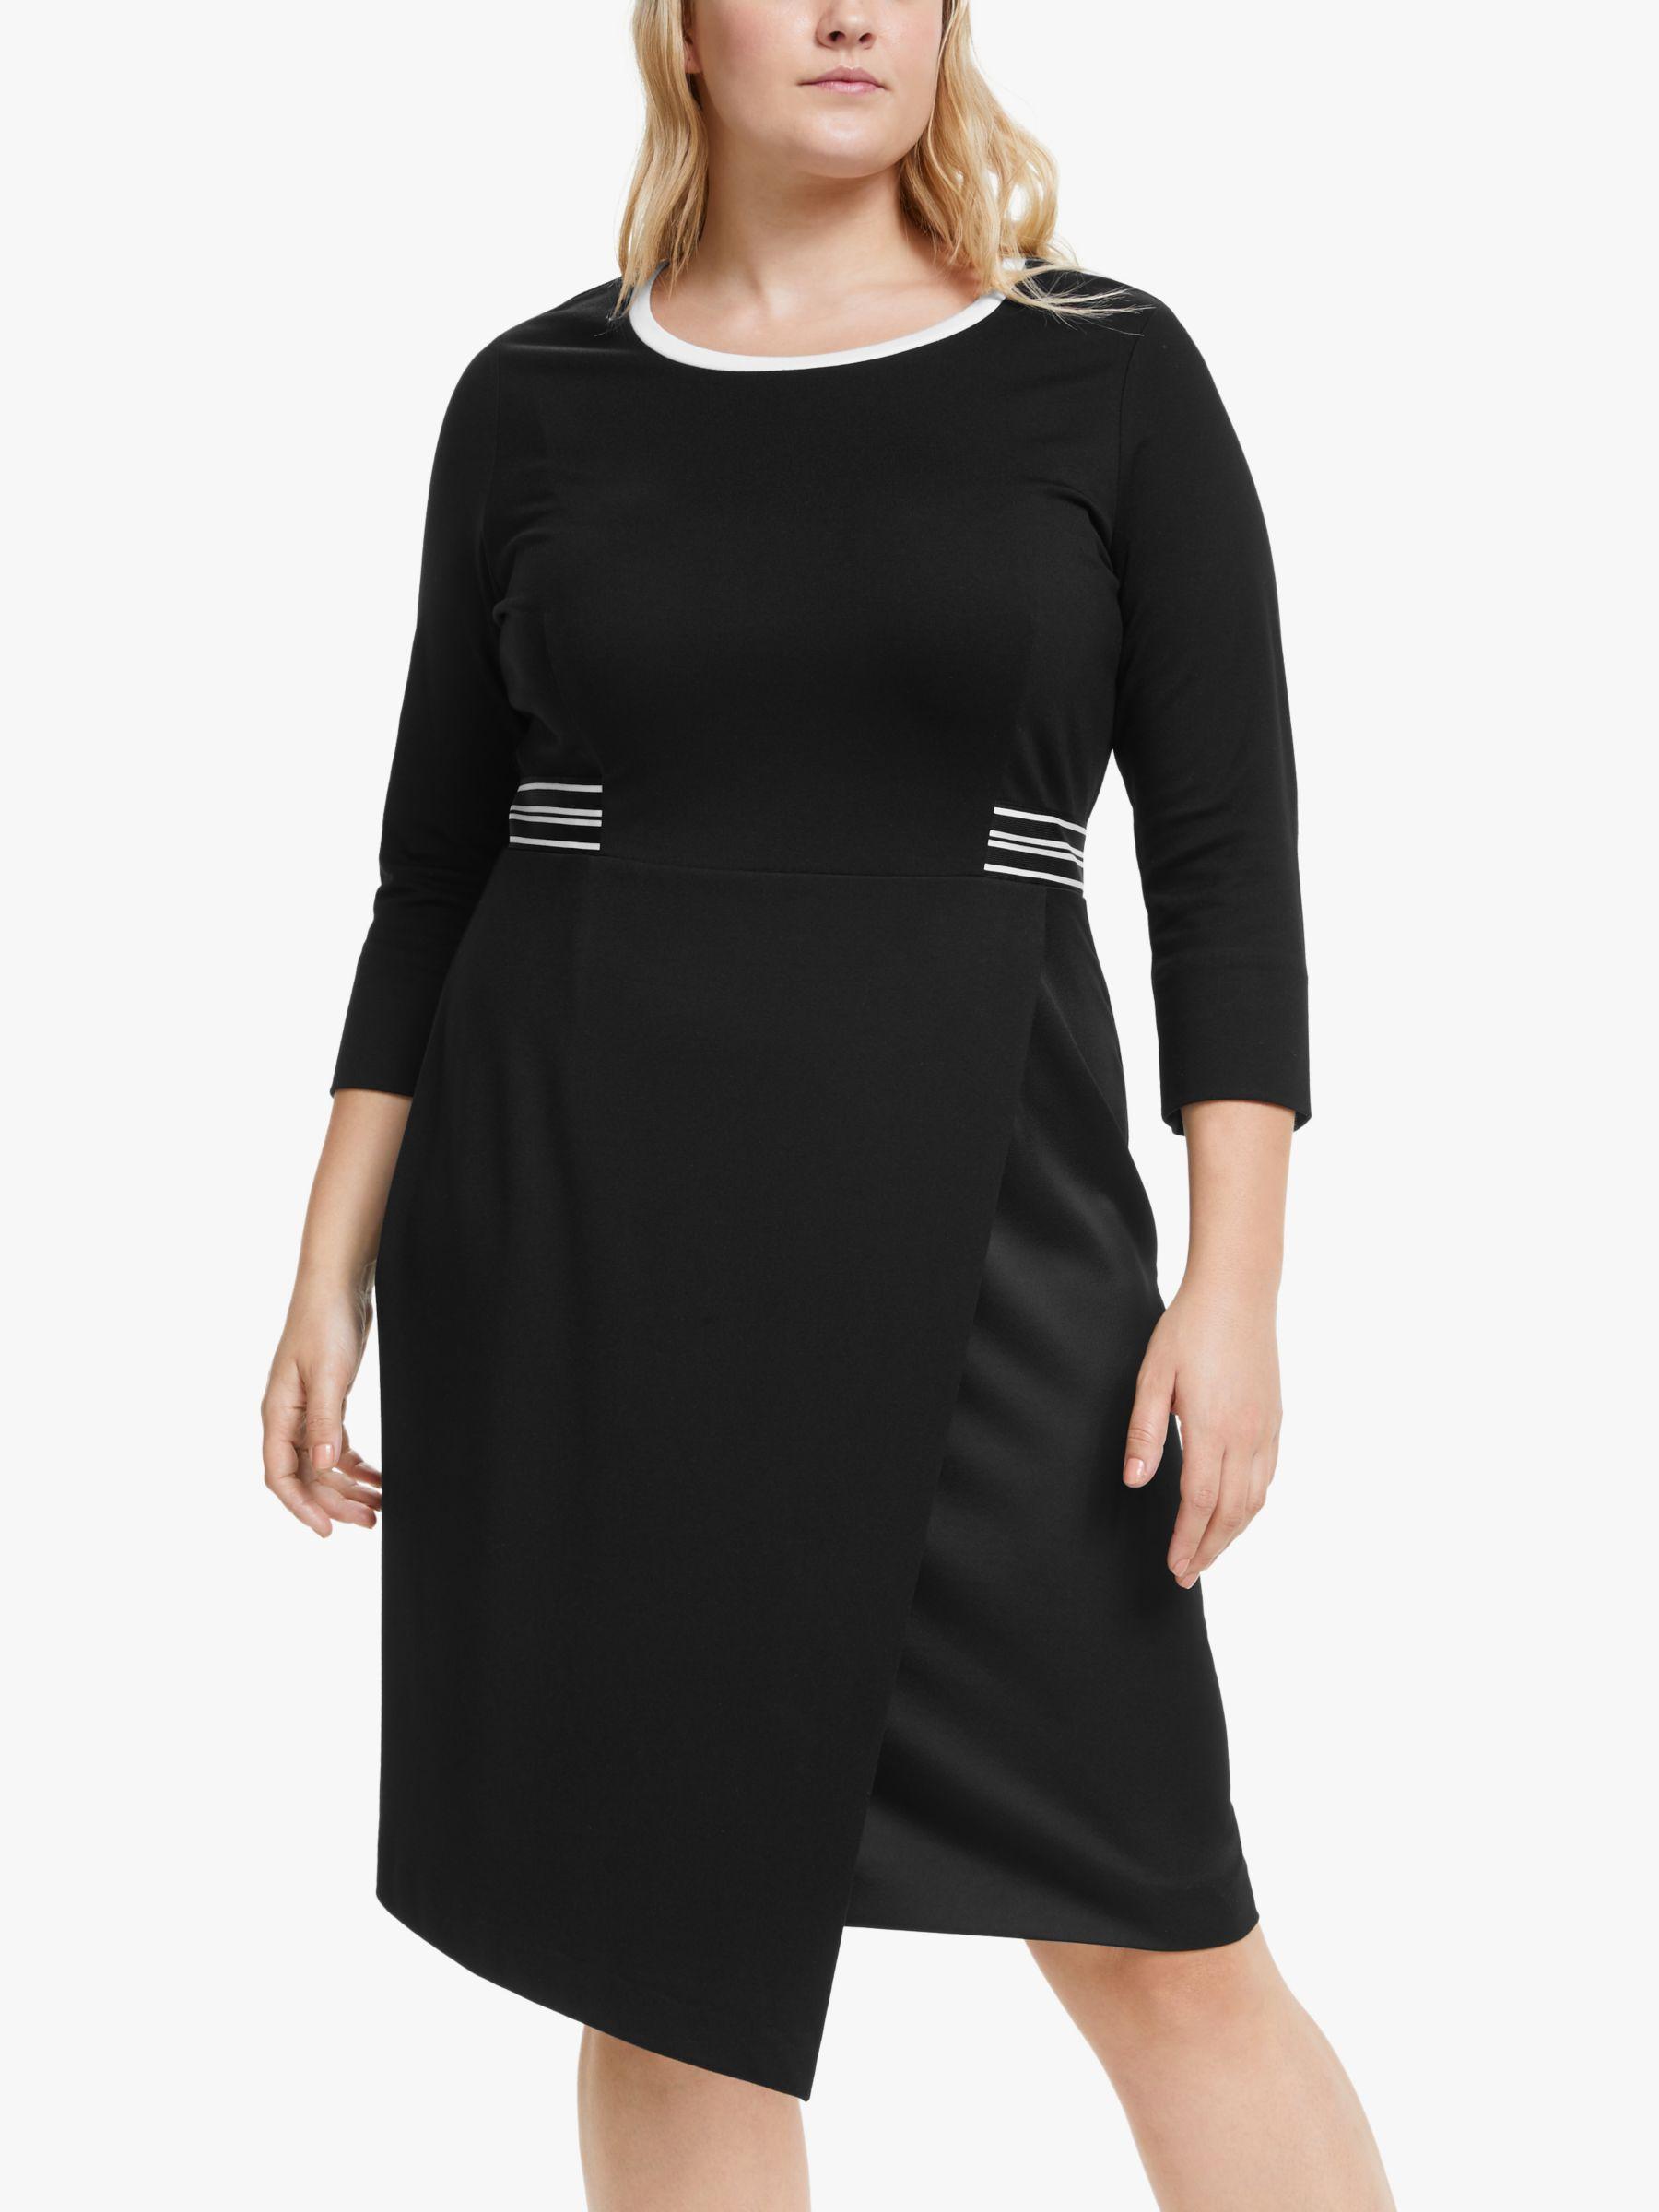 Persona by Marina Rinaldi Persona by Marina Rinaldi Onda Stripe Dress, Black